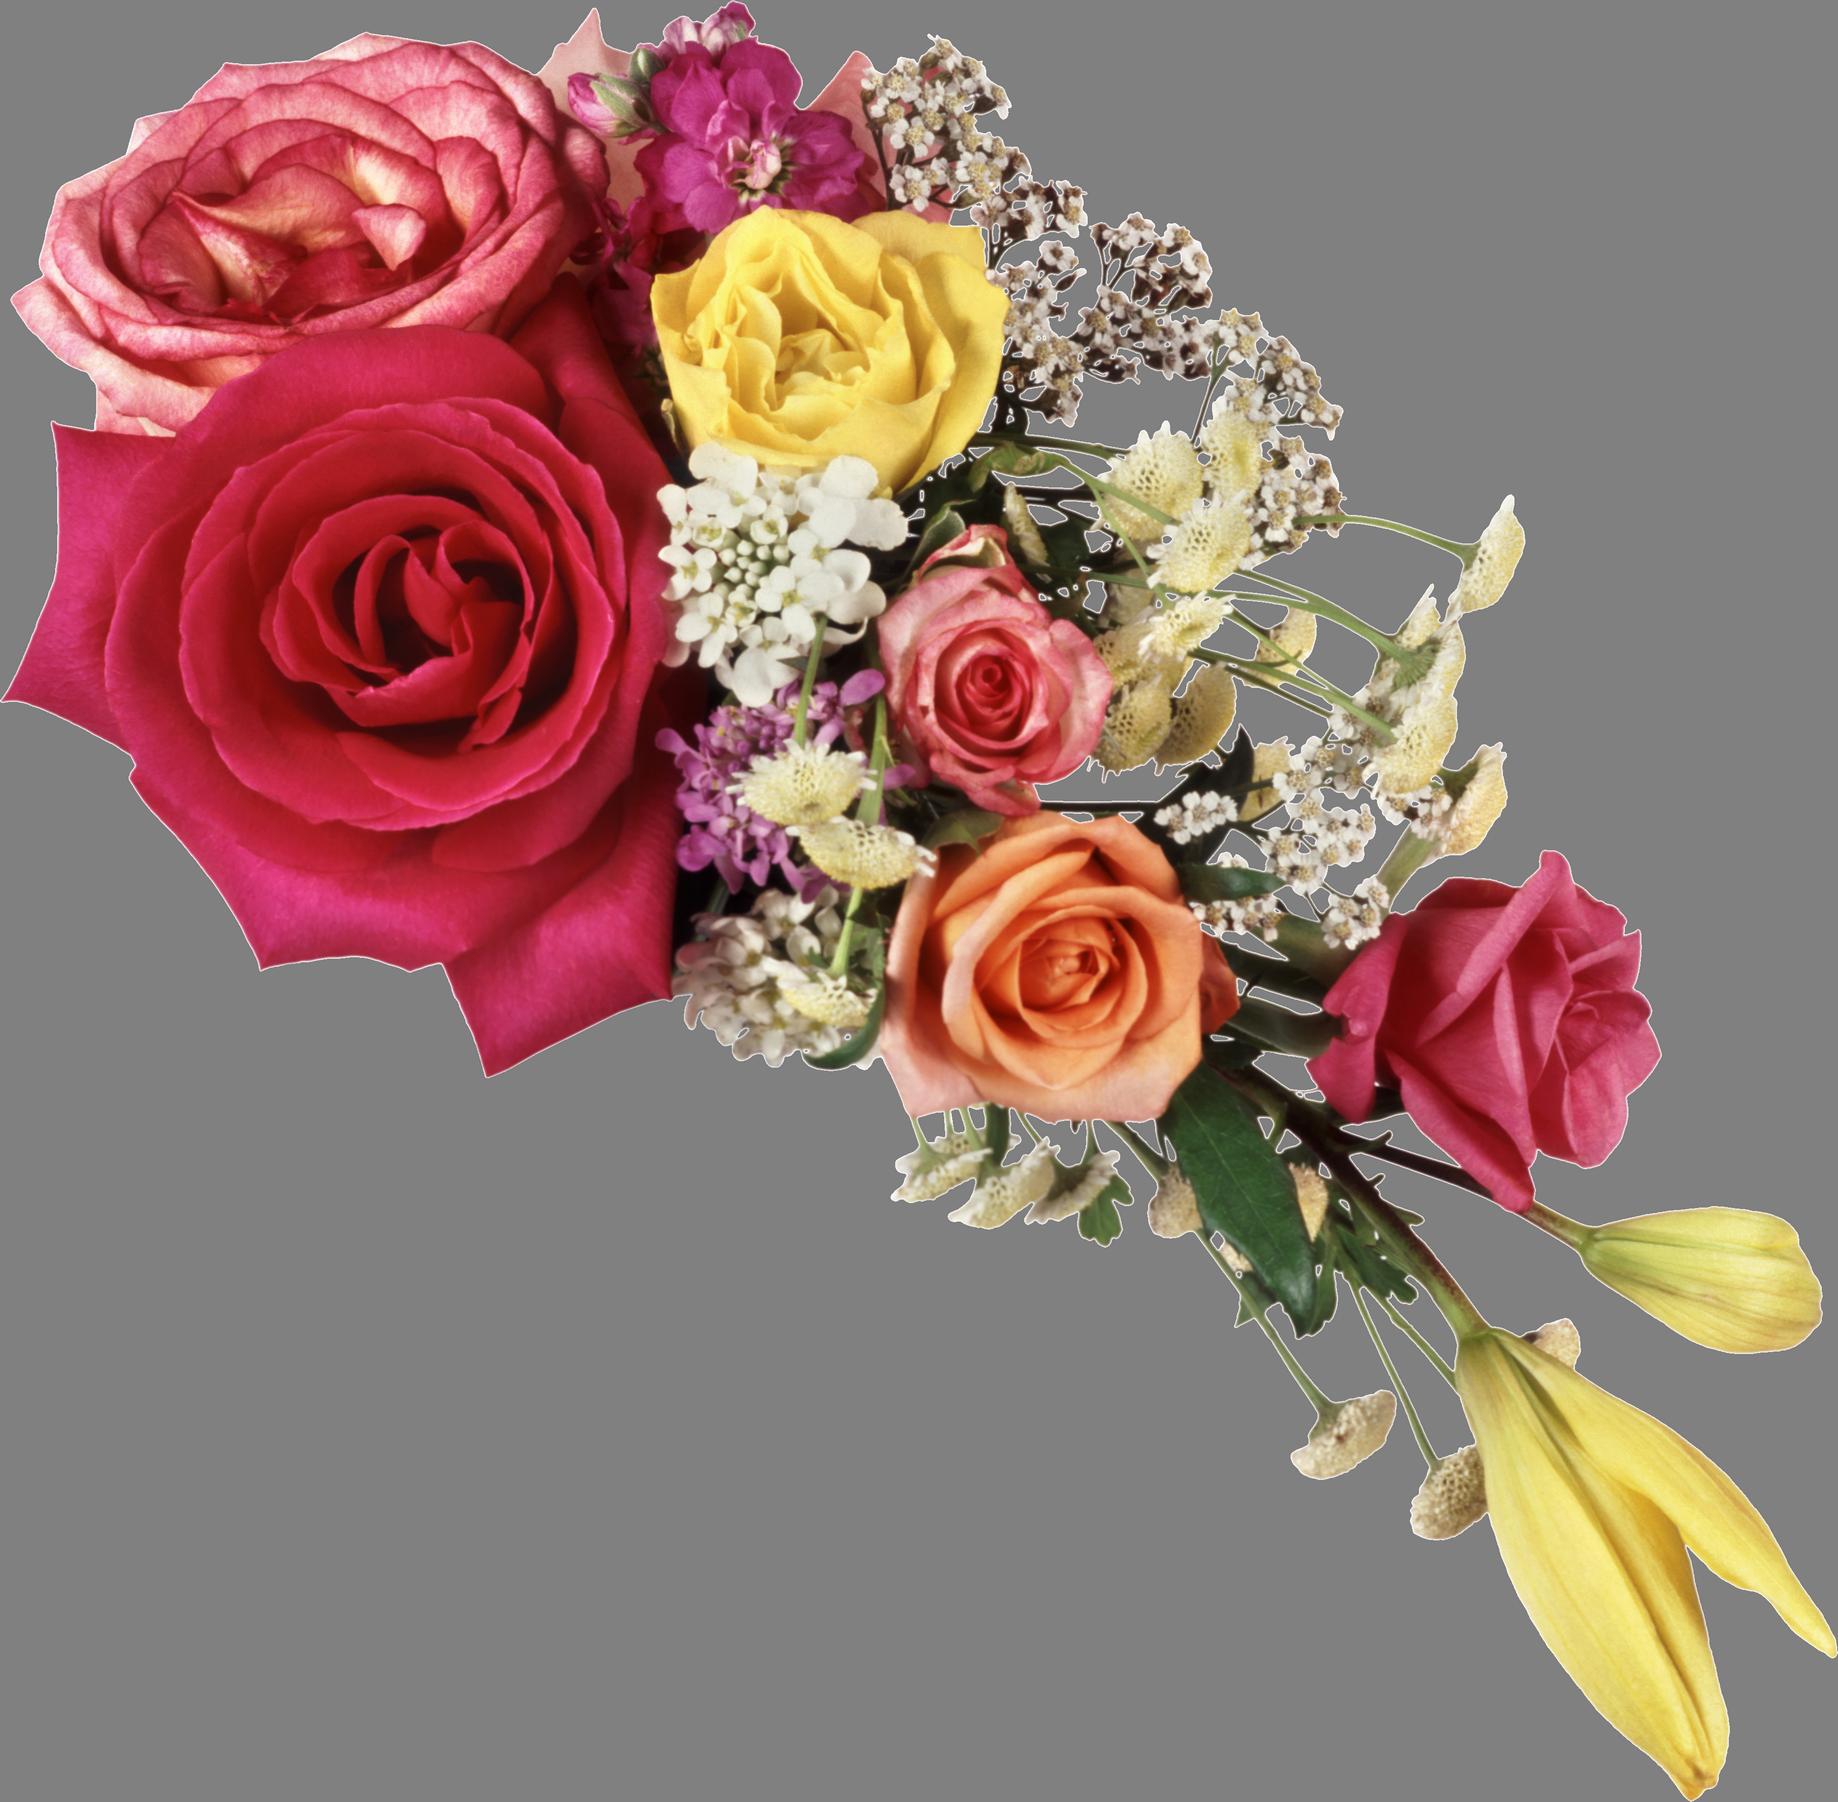 Bouquet Of Flowers Png Image Purepng Free Transparent Cc0 Png